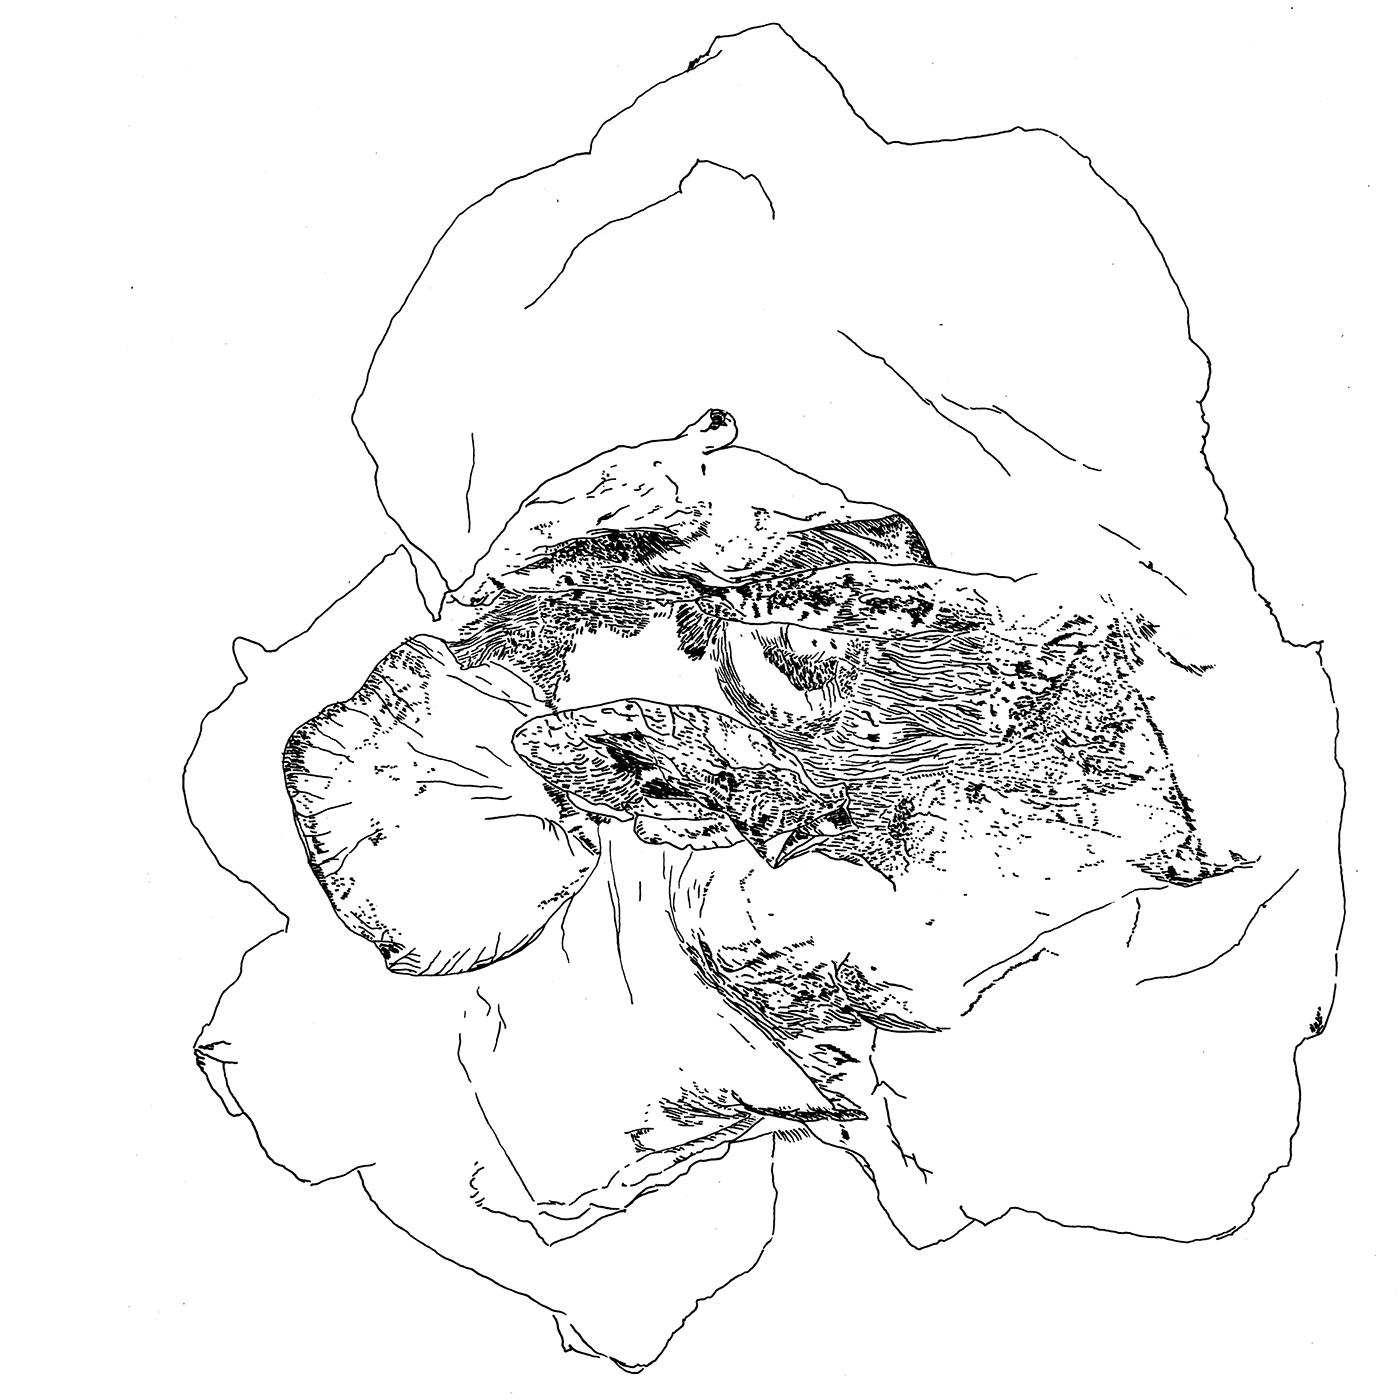 contemporaryart Modernart abstractart artwork ILLUSTRATION  blackandwhite art Drawing  Fine Arts